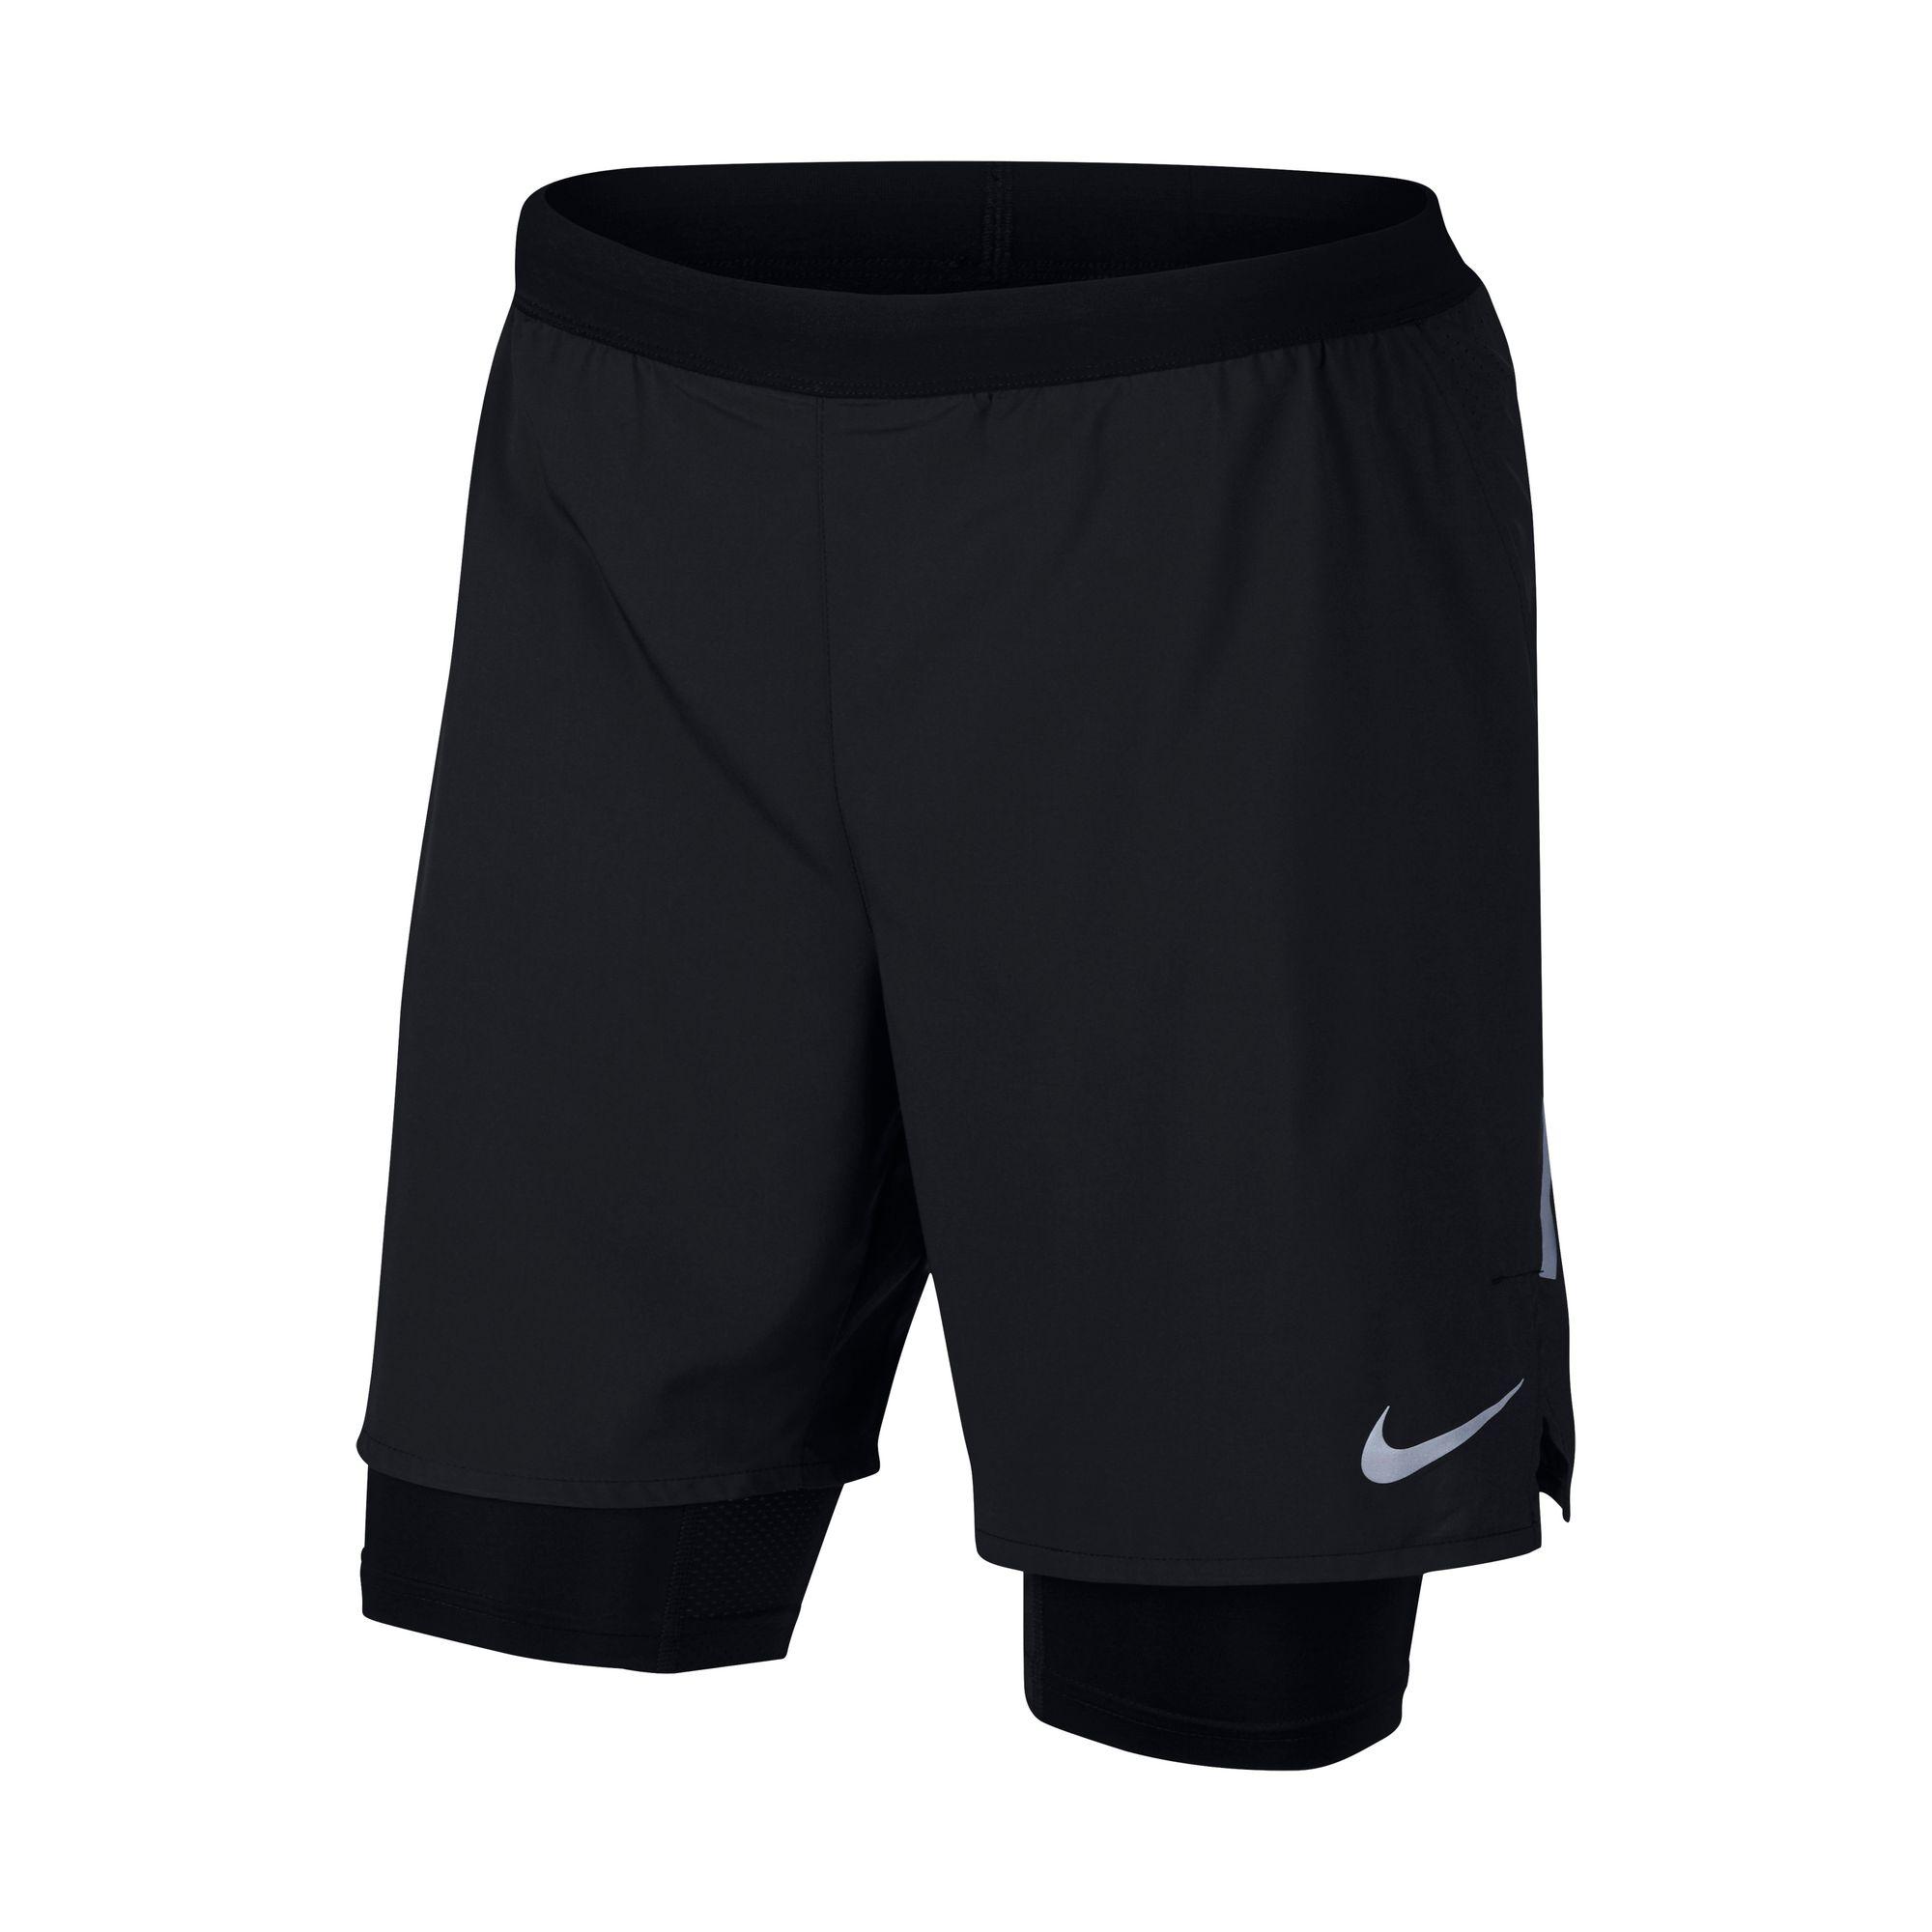 887471709ae4ab Nike Herren Laufhose FLX DSTNCE SHRT 7IN 2IN1 001